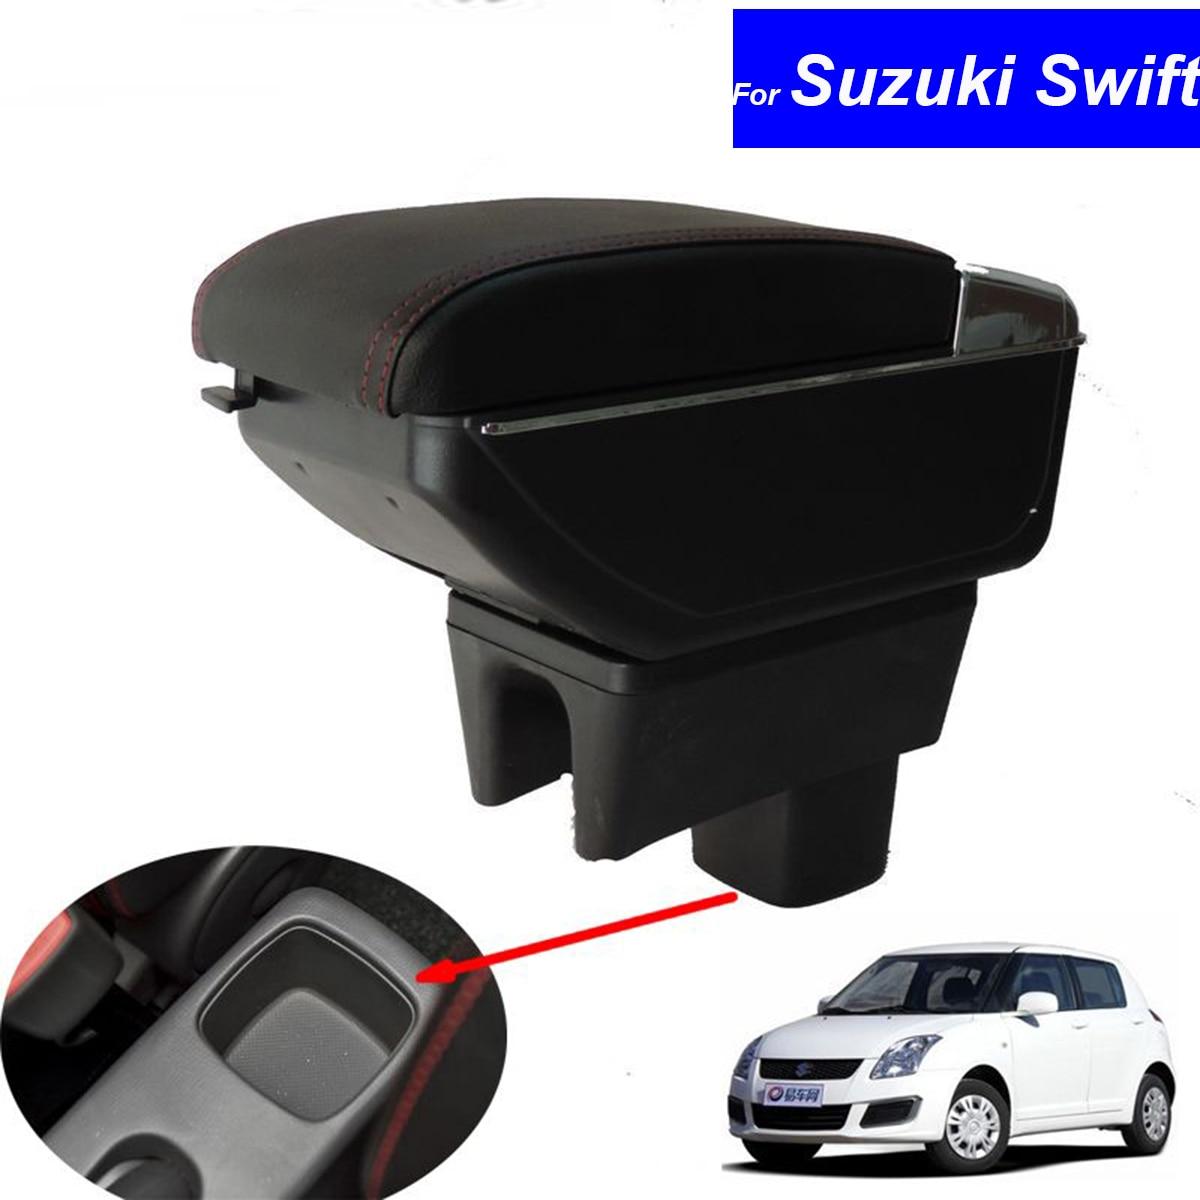 Leather Car Center Console Armrest Box for Suzuki Swift 2008 2009 2010 2011 2012 2013 2014